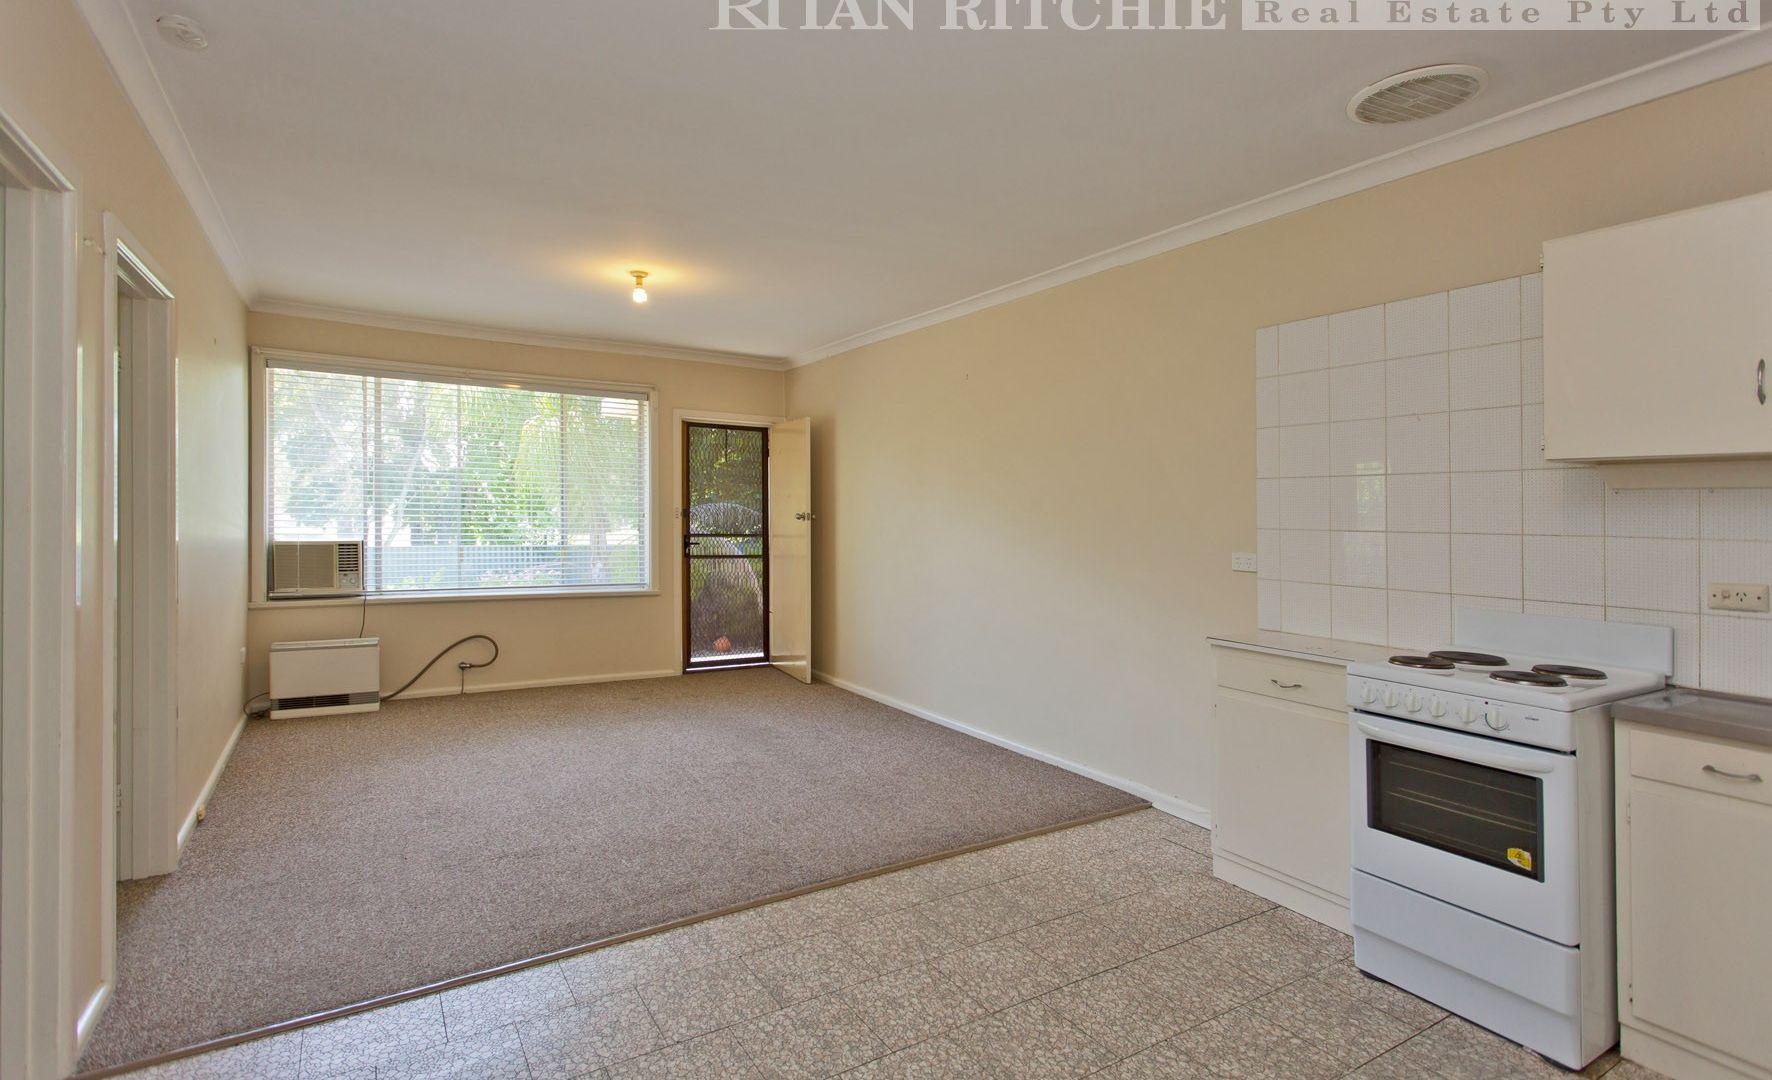 9/707 David Street, Albury NSW 2640, Image 2